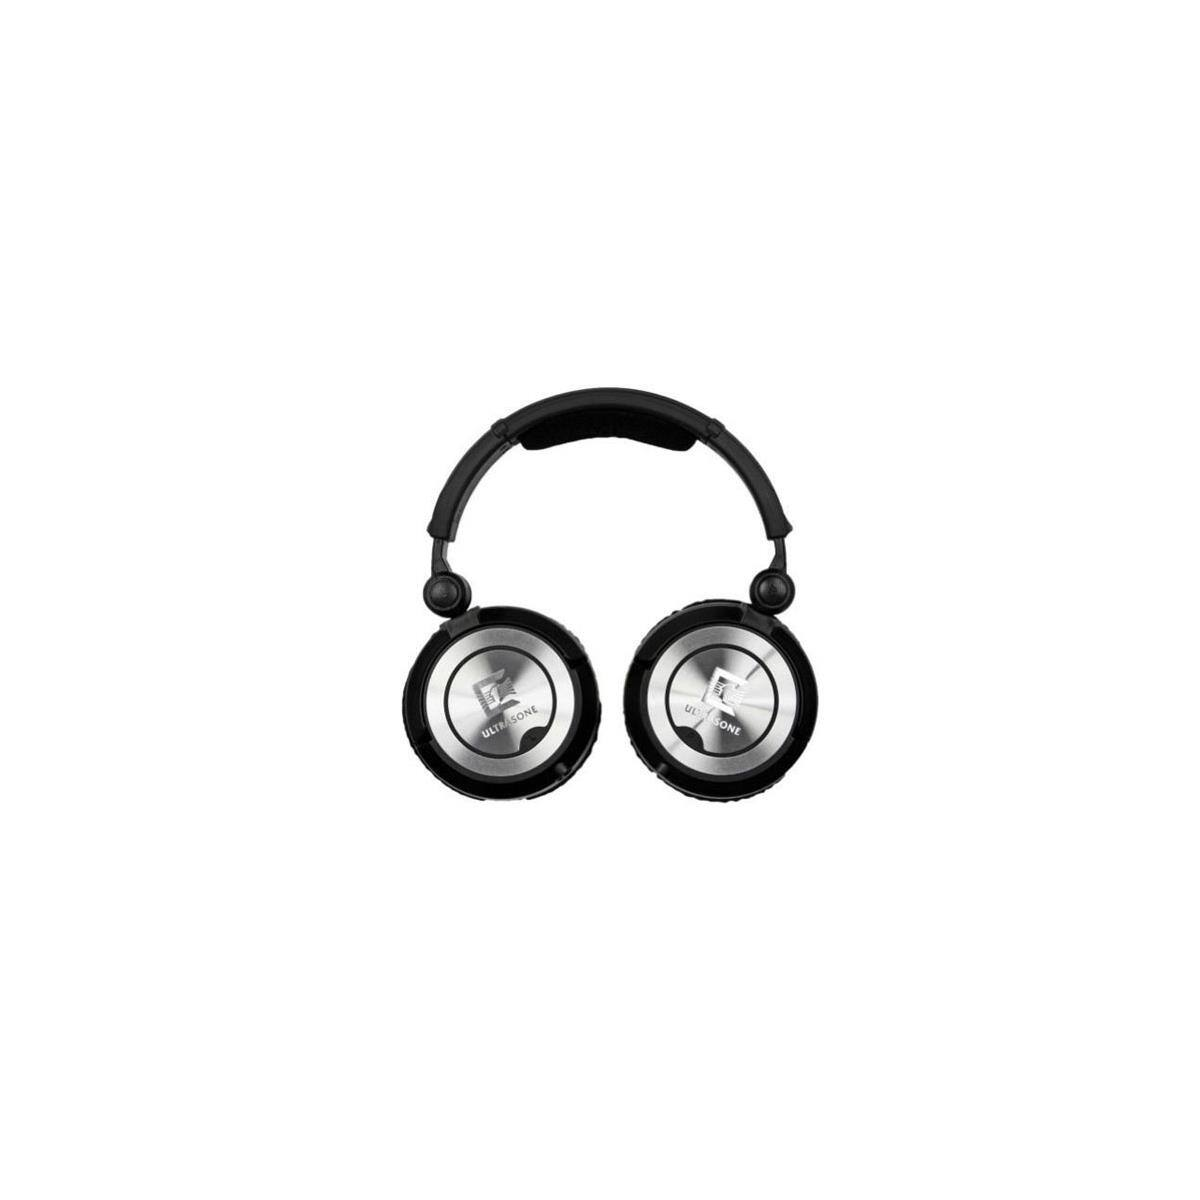 Ultrasone PRO-900i Closed-Back S-sound (bassy) Headphones $260 + free shipping